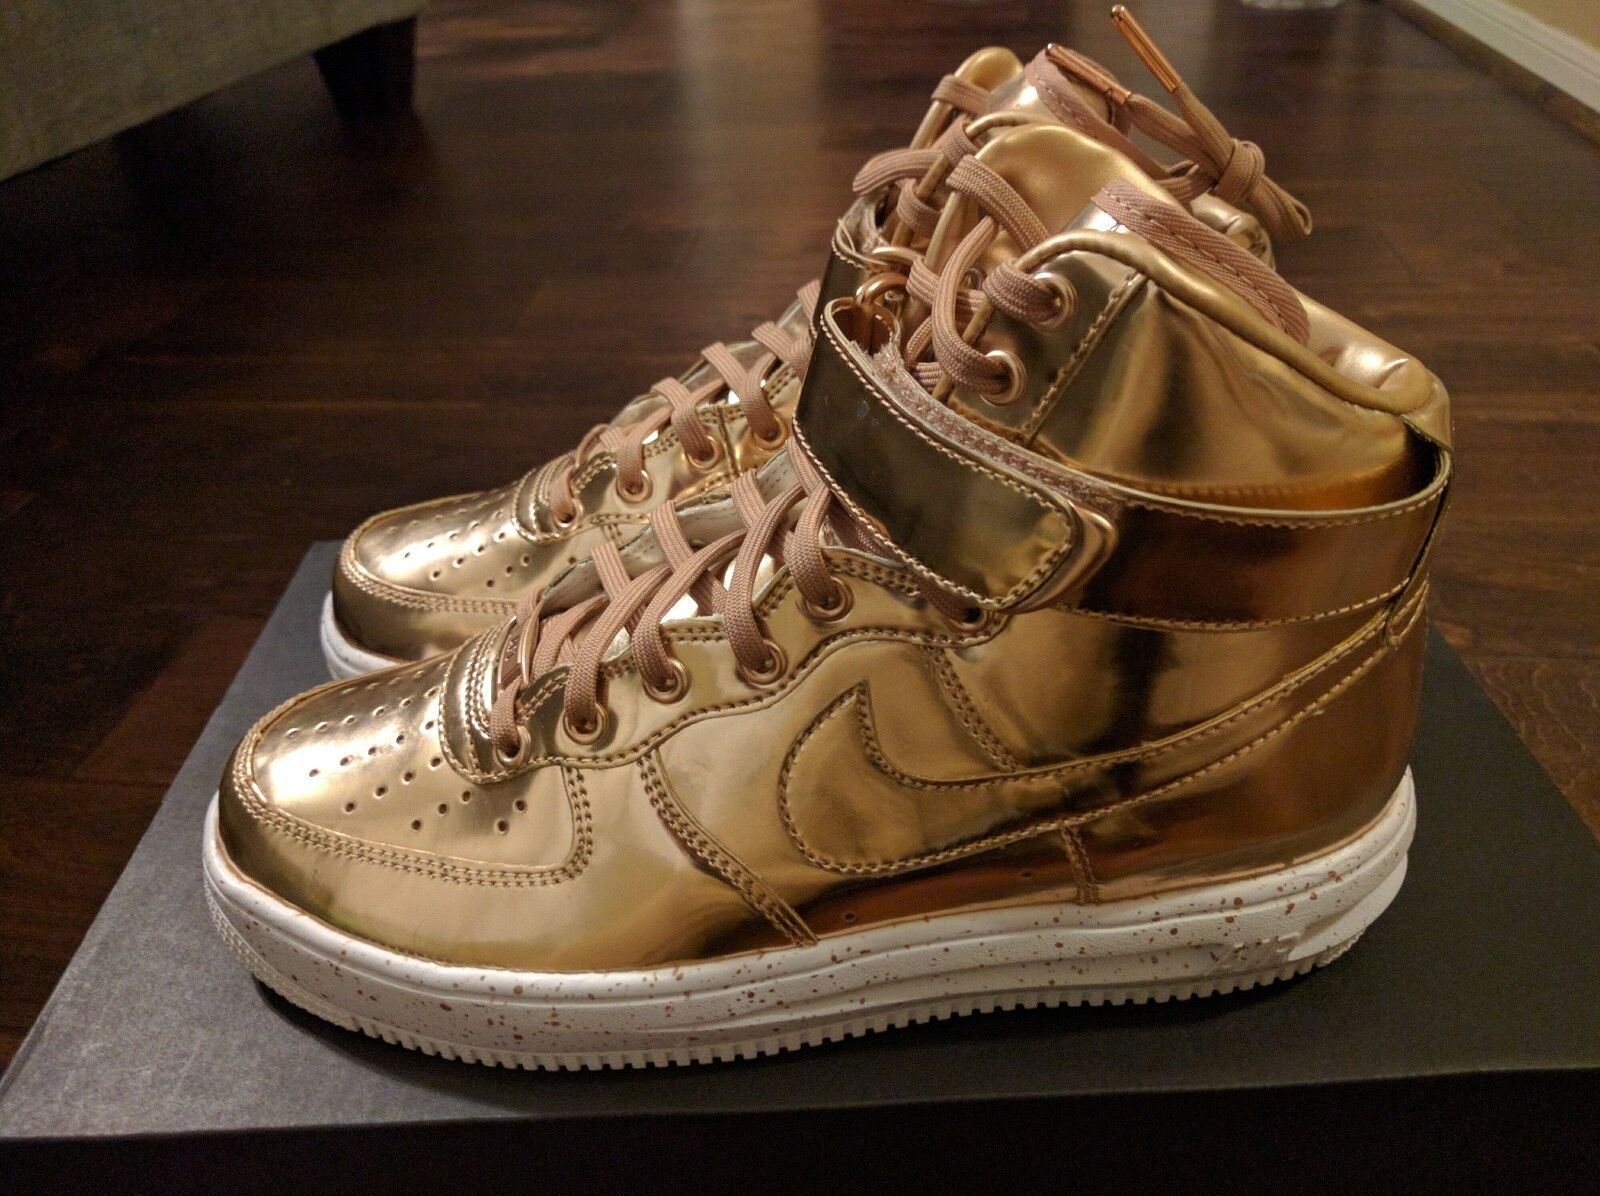 Nike air force 1 bronzo rosa d'oro metallico liquido ad alta id sneakerboots lunare